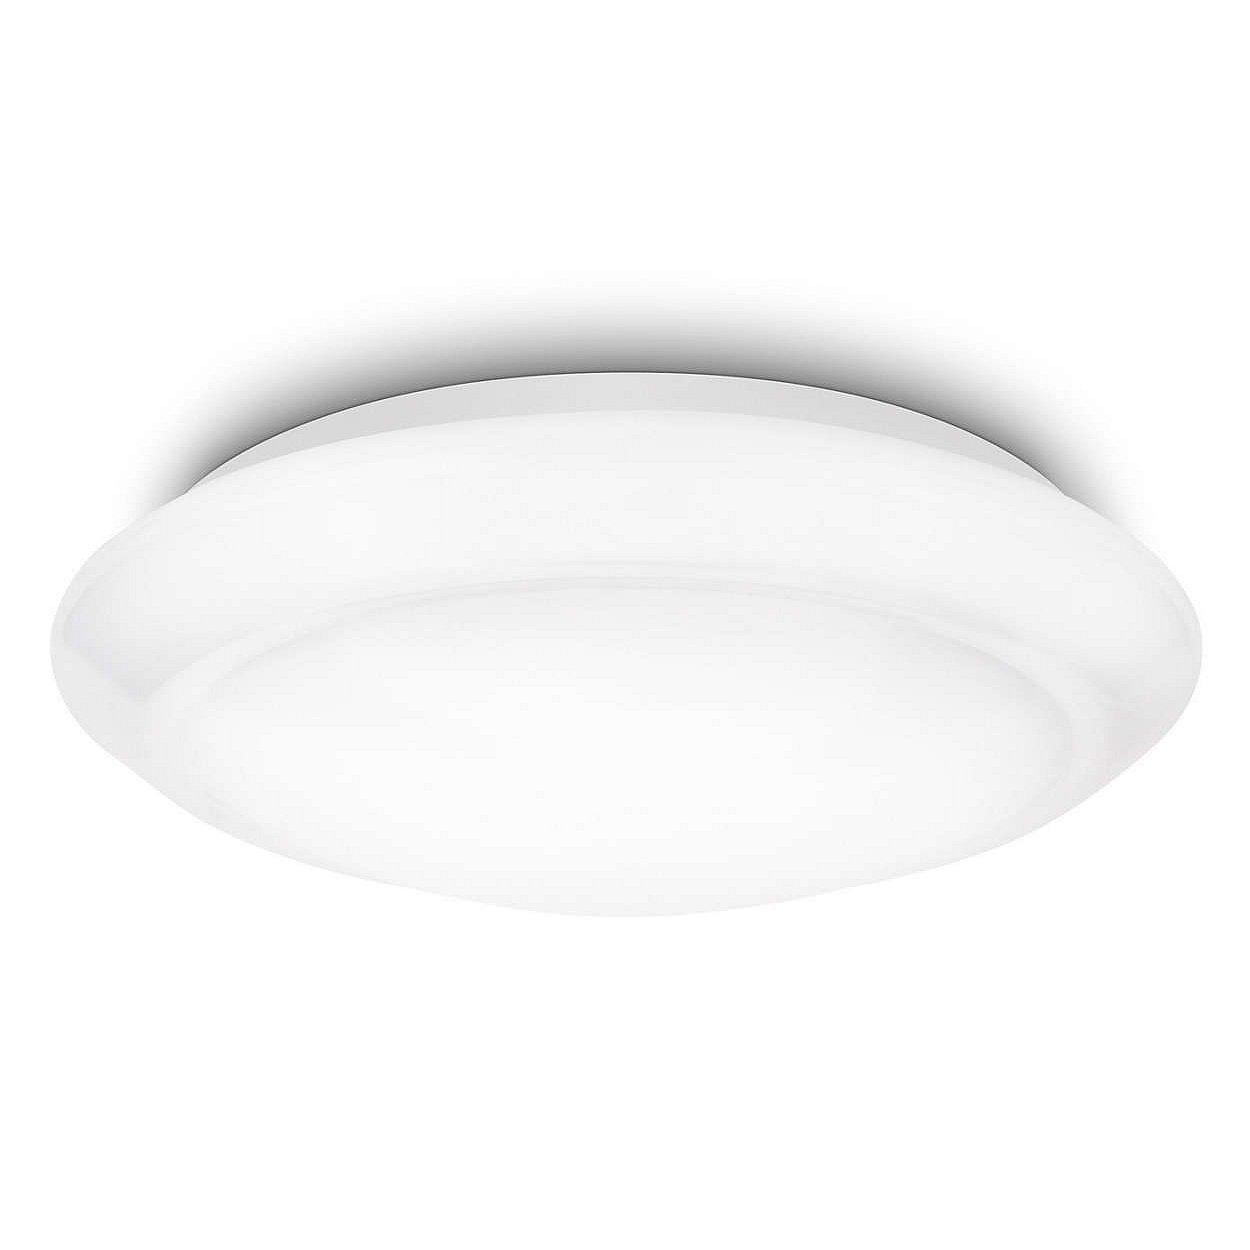 Svítidlo LED Philips Cinnabar, 2700K, 6W, bílá